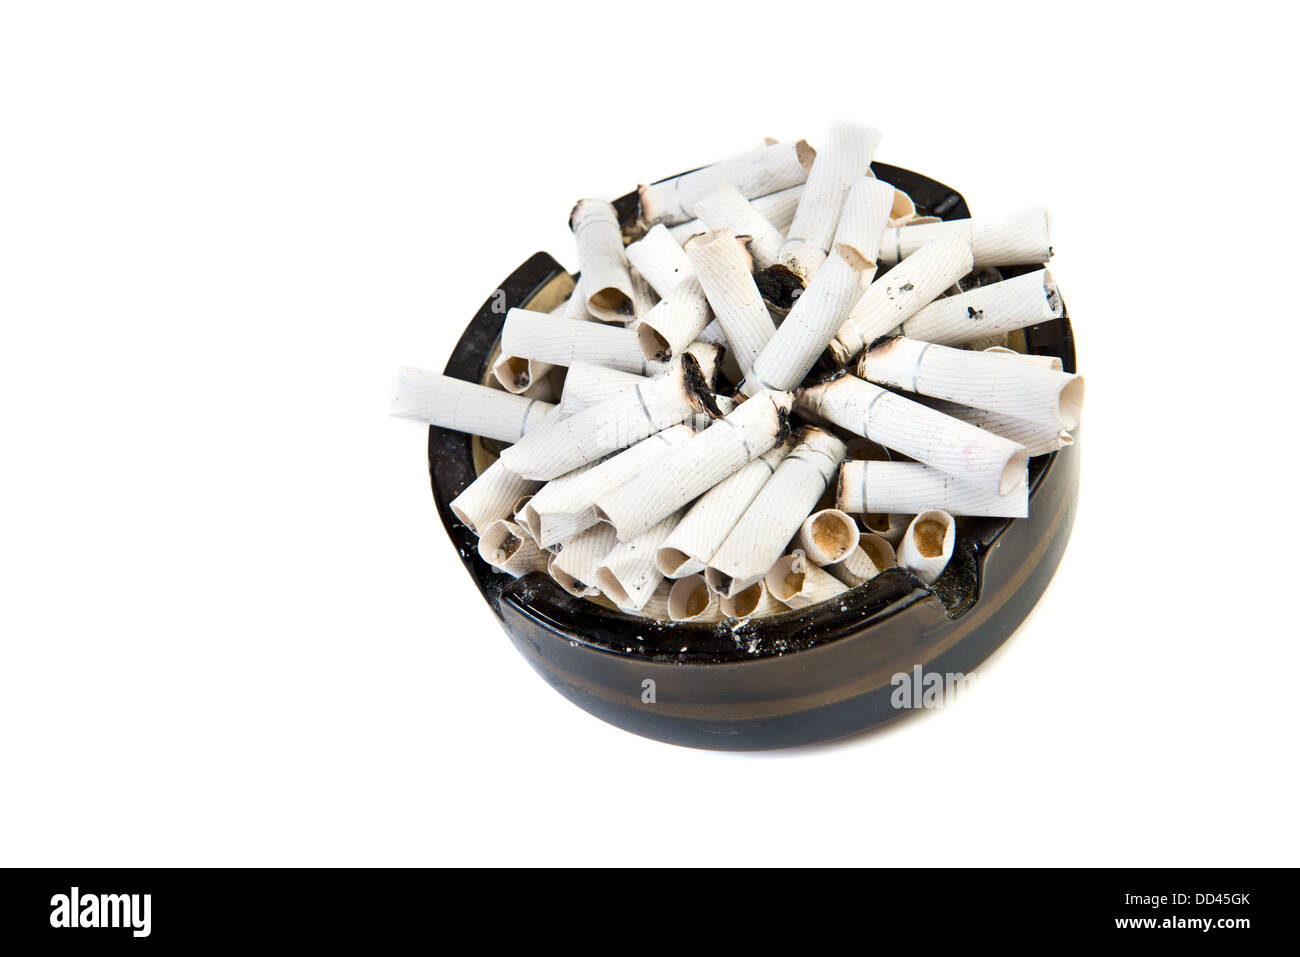 ashtray cigarettes stockfotos ashtray cigarettes bilder. Black Bedroom Furniture Sets. Home Design Ideas